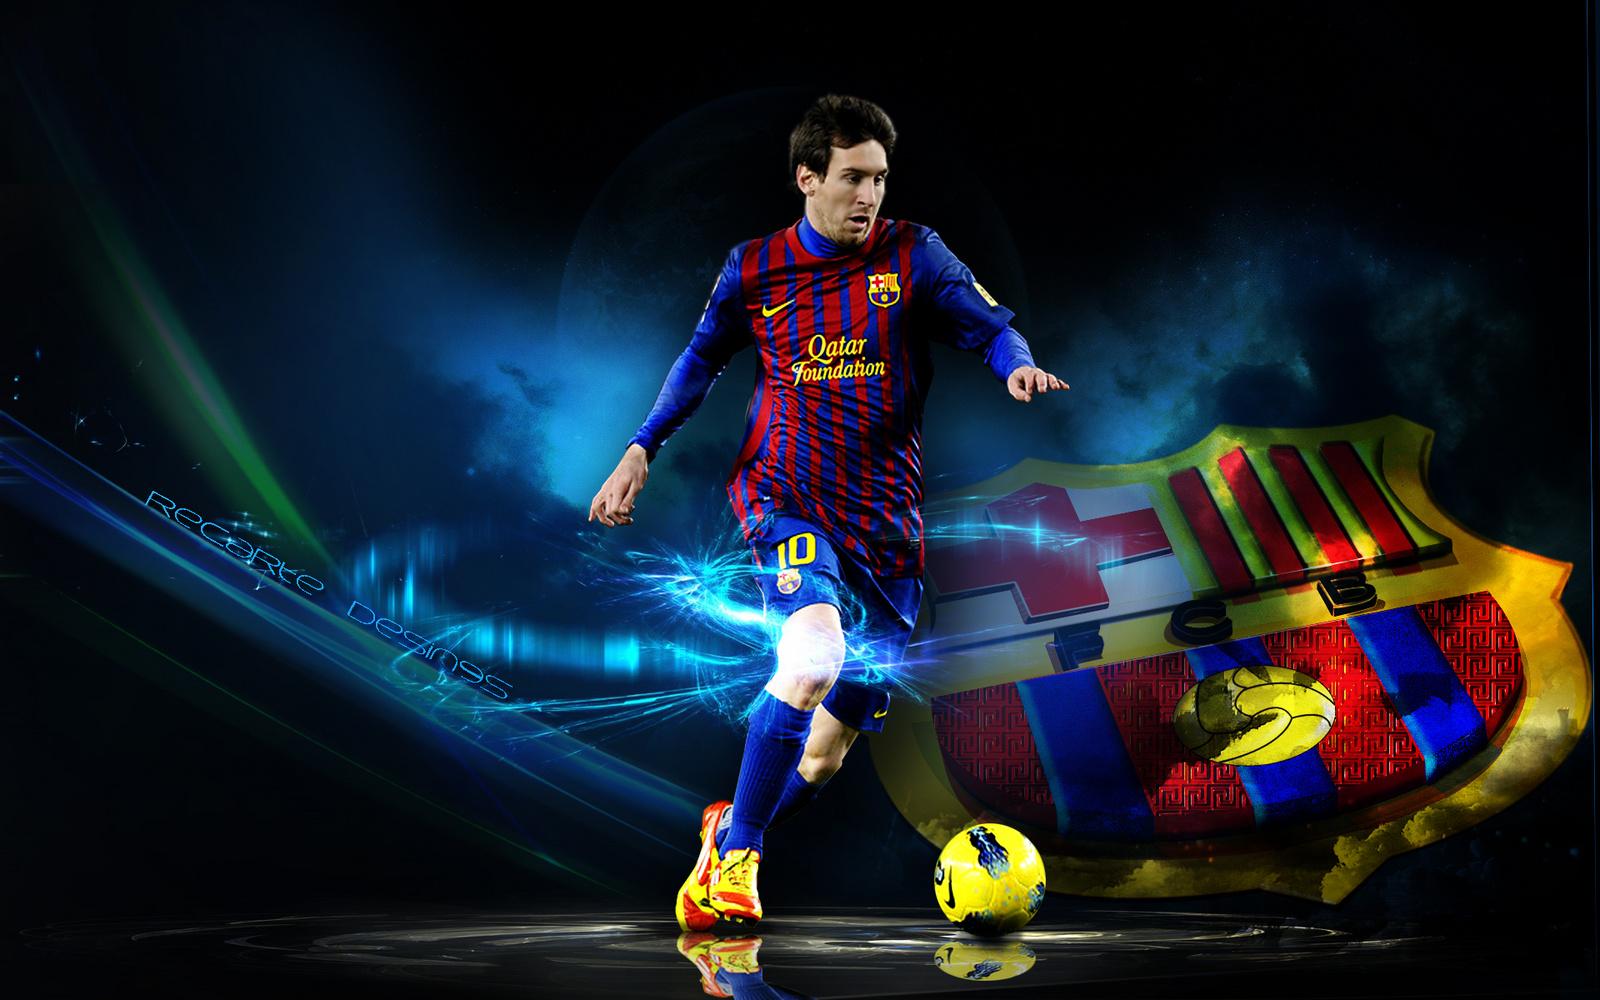 http://3.bp.blogspot.com/-ynBYJUPlTEQ/T-gg6ZtHi2I/AAAAAAAAAFY/zufipR1ICfU/s1600/Lionel-Messi-2012-HD-Wallpapers.jpg